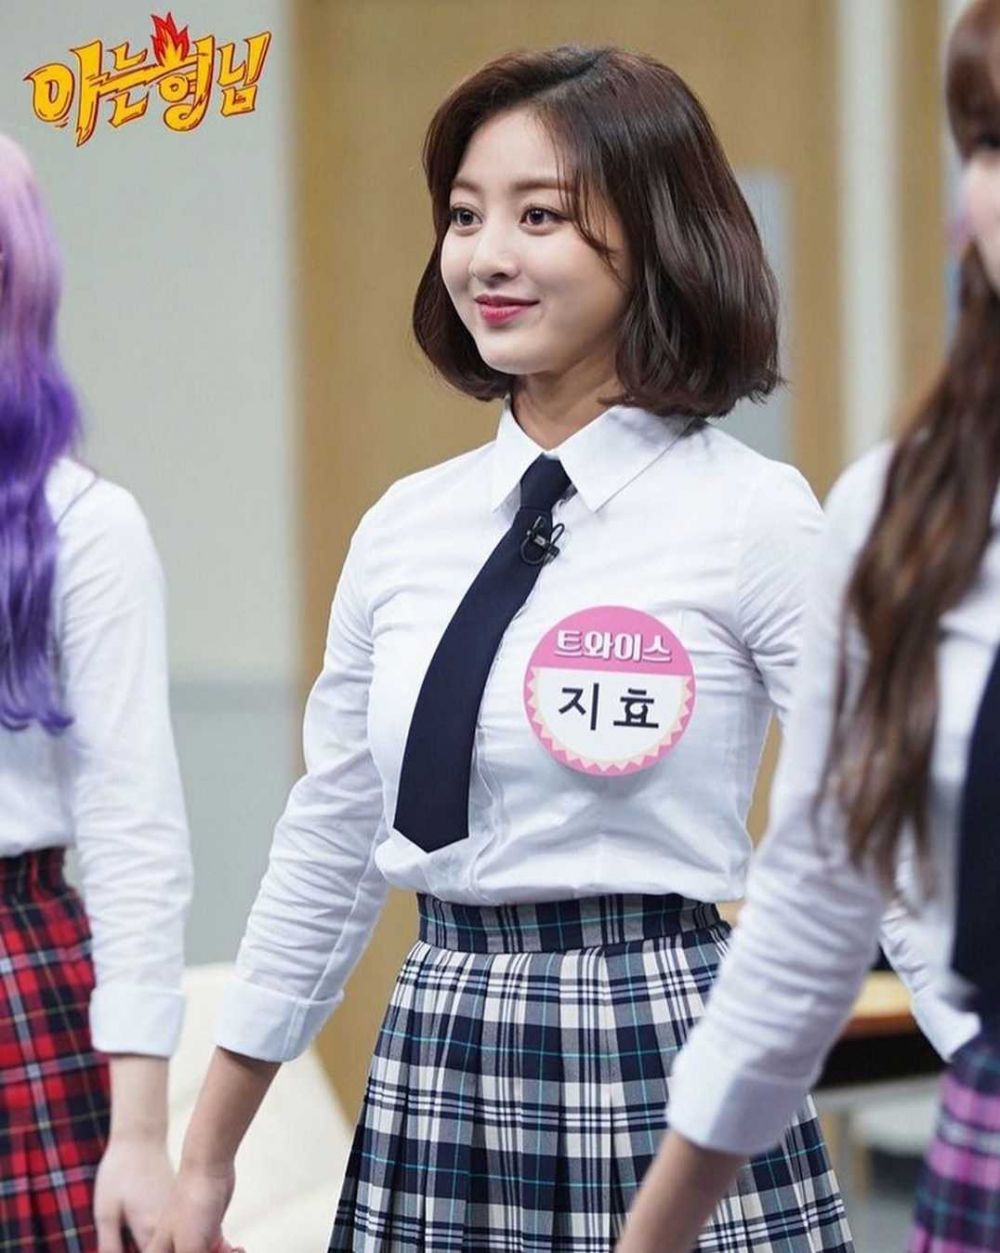 9 Potret Jihyo TWICE Memakai Kostum Seragam Sekolah, Bikin Gemas!